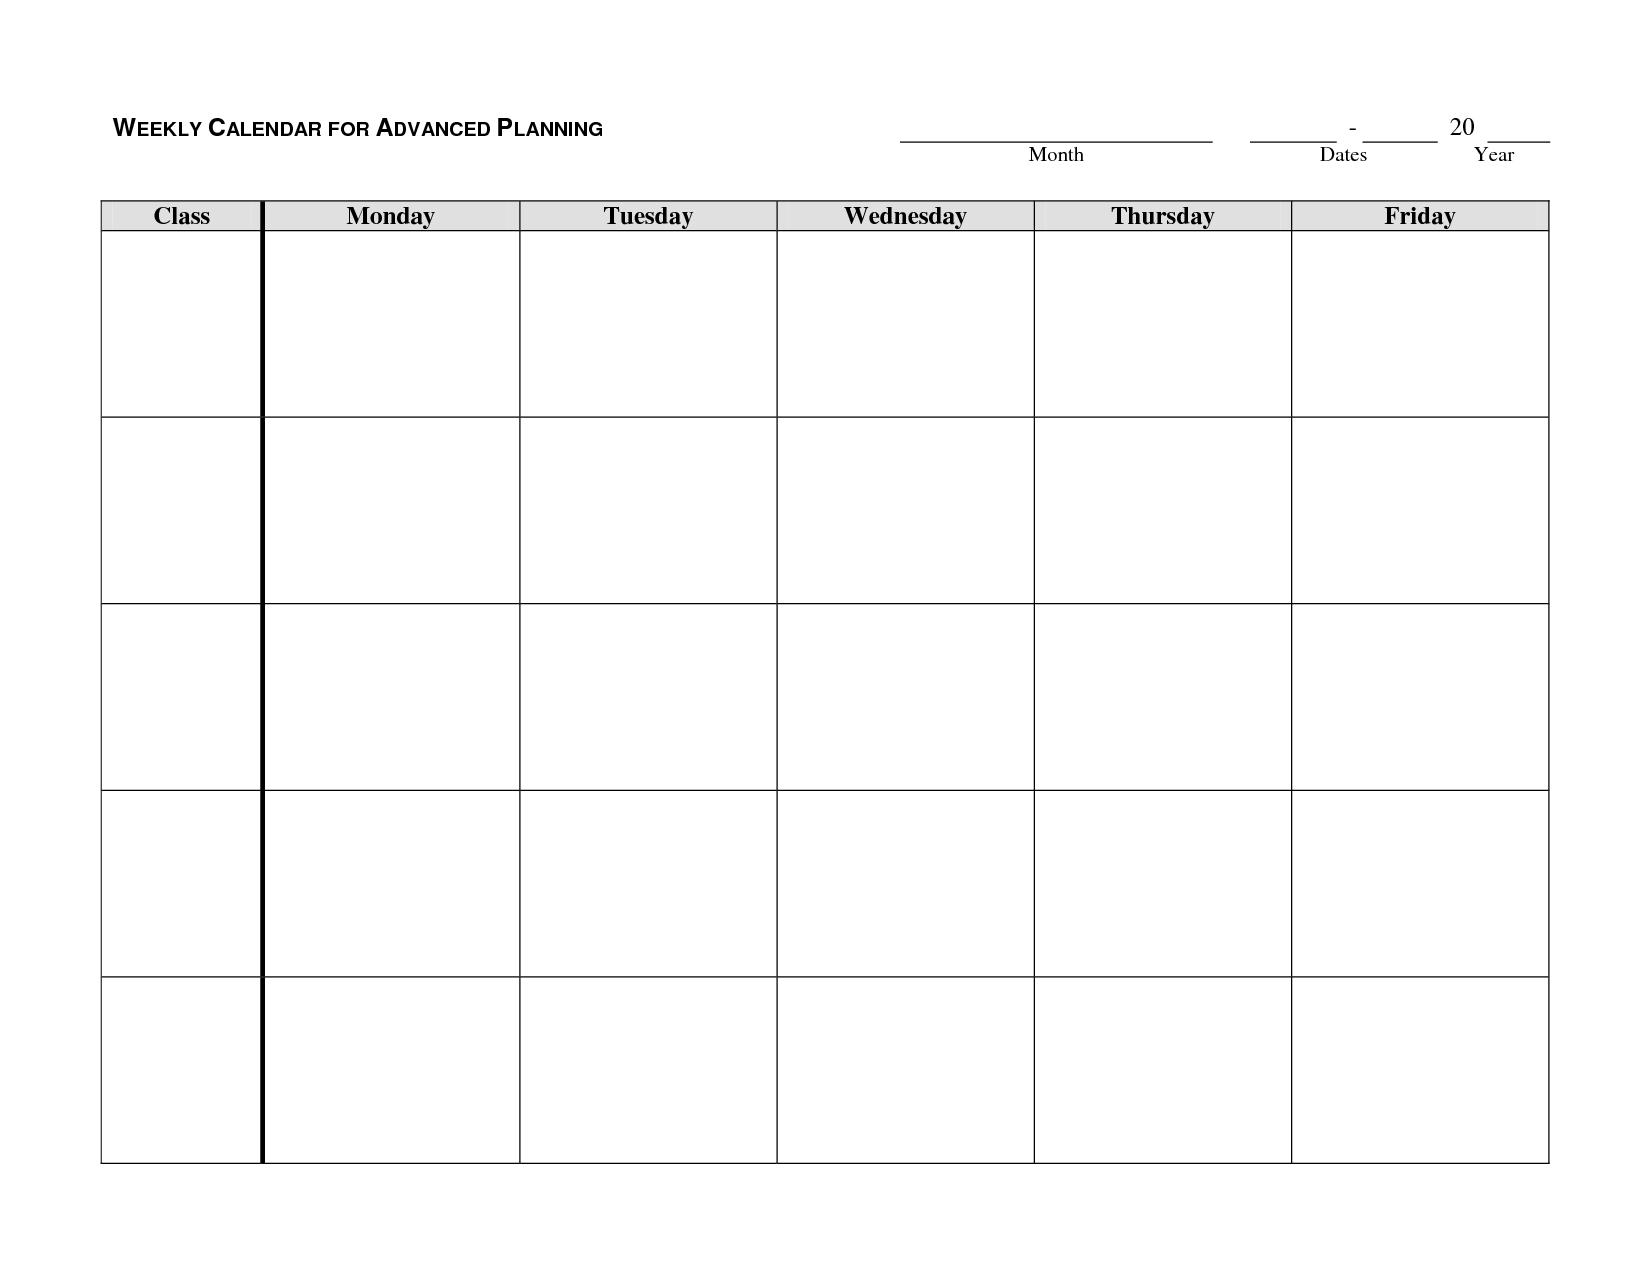 Monday Through Friday Printable Weekly Schedule - Yeniscale.co  Printable Weekly Calendar Monday Through Friday